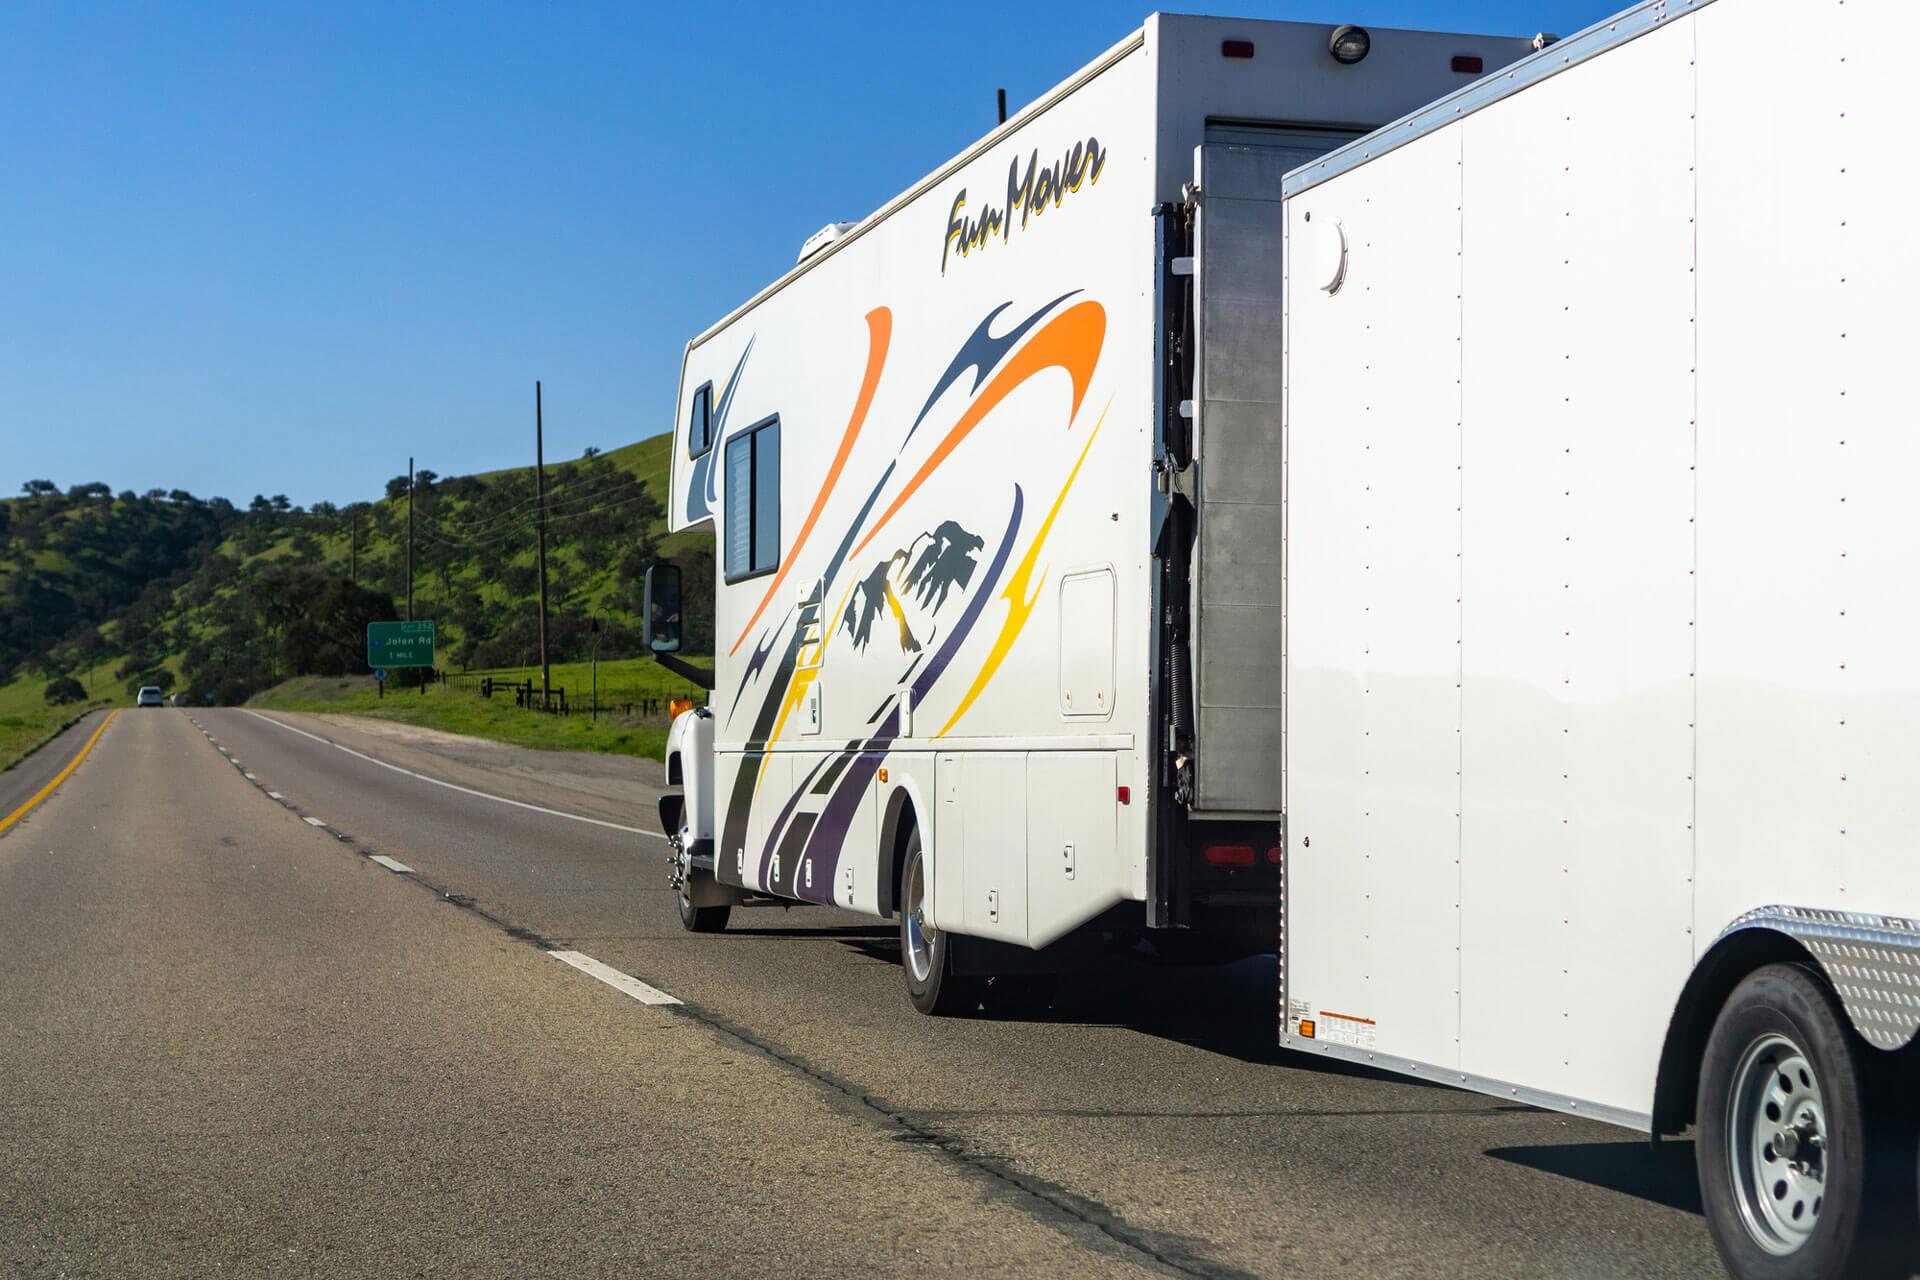 Motorhome & Travel Trailer Lock & Keys Local Service